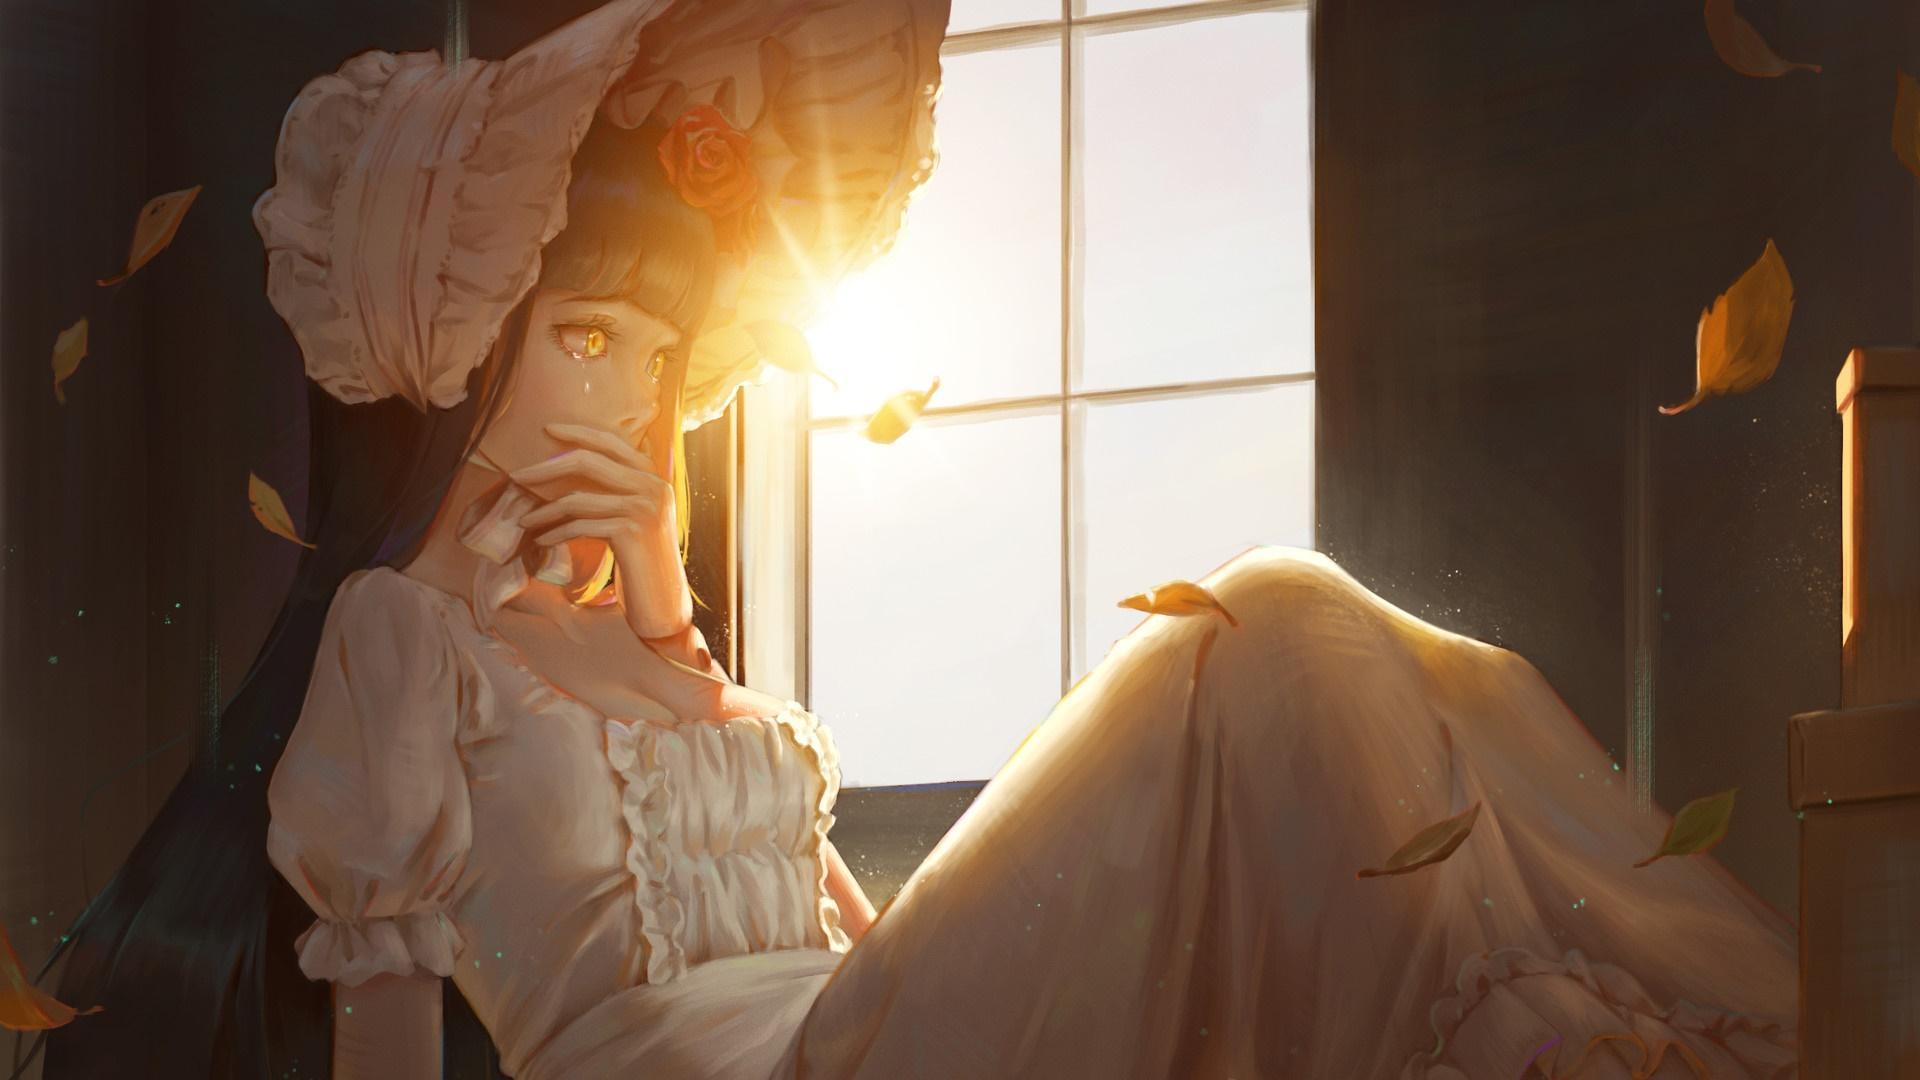 Sad Anime Girl Hd Wallpaper Backiee Free Ultra Hd Wallpaper Platform